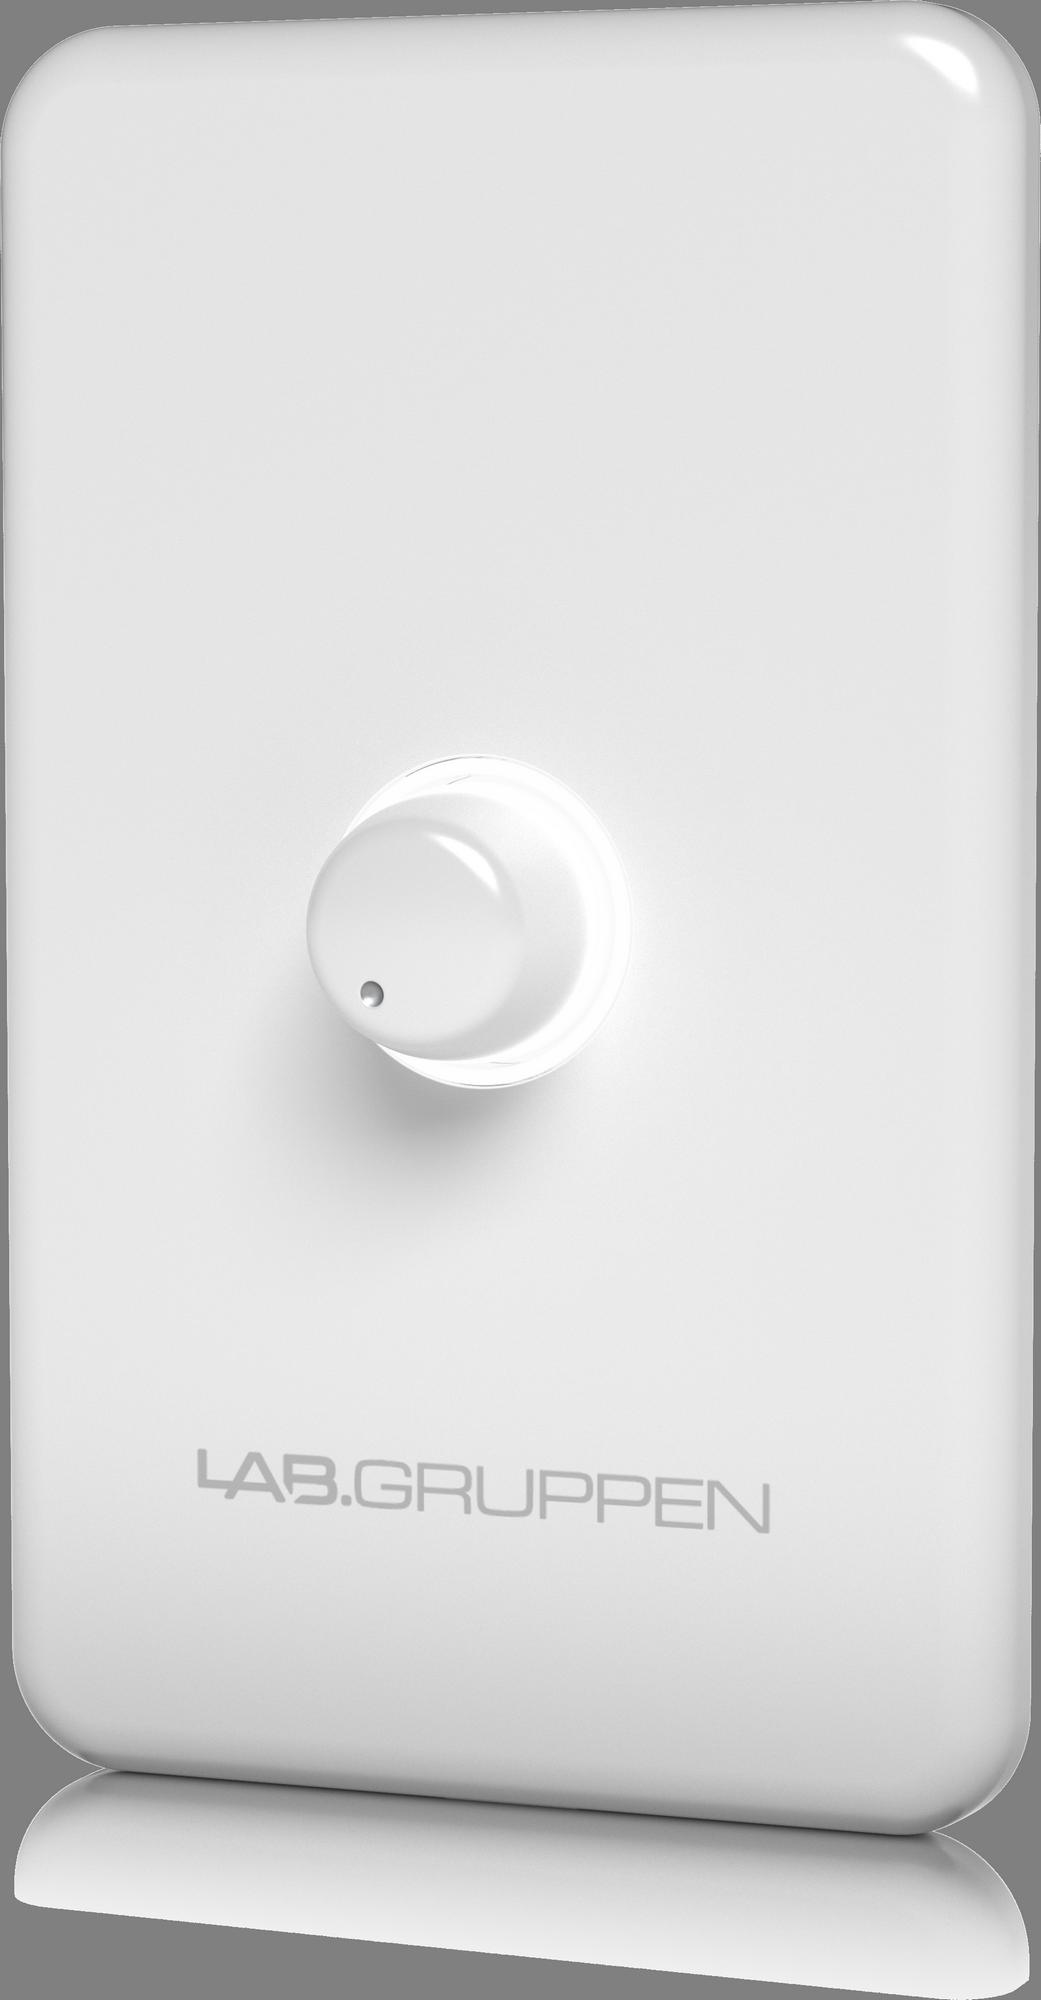 Lab Gruppen CRC-VUL-WH - Volume controller